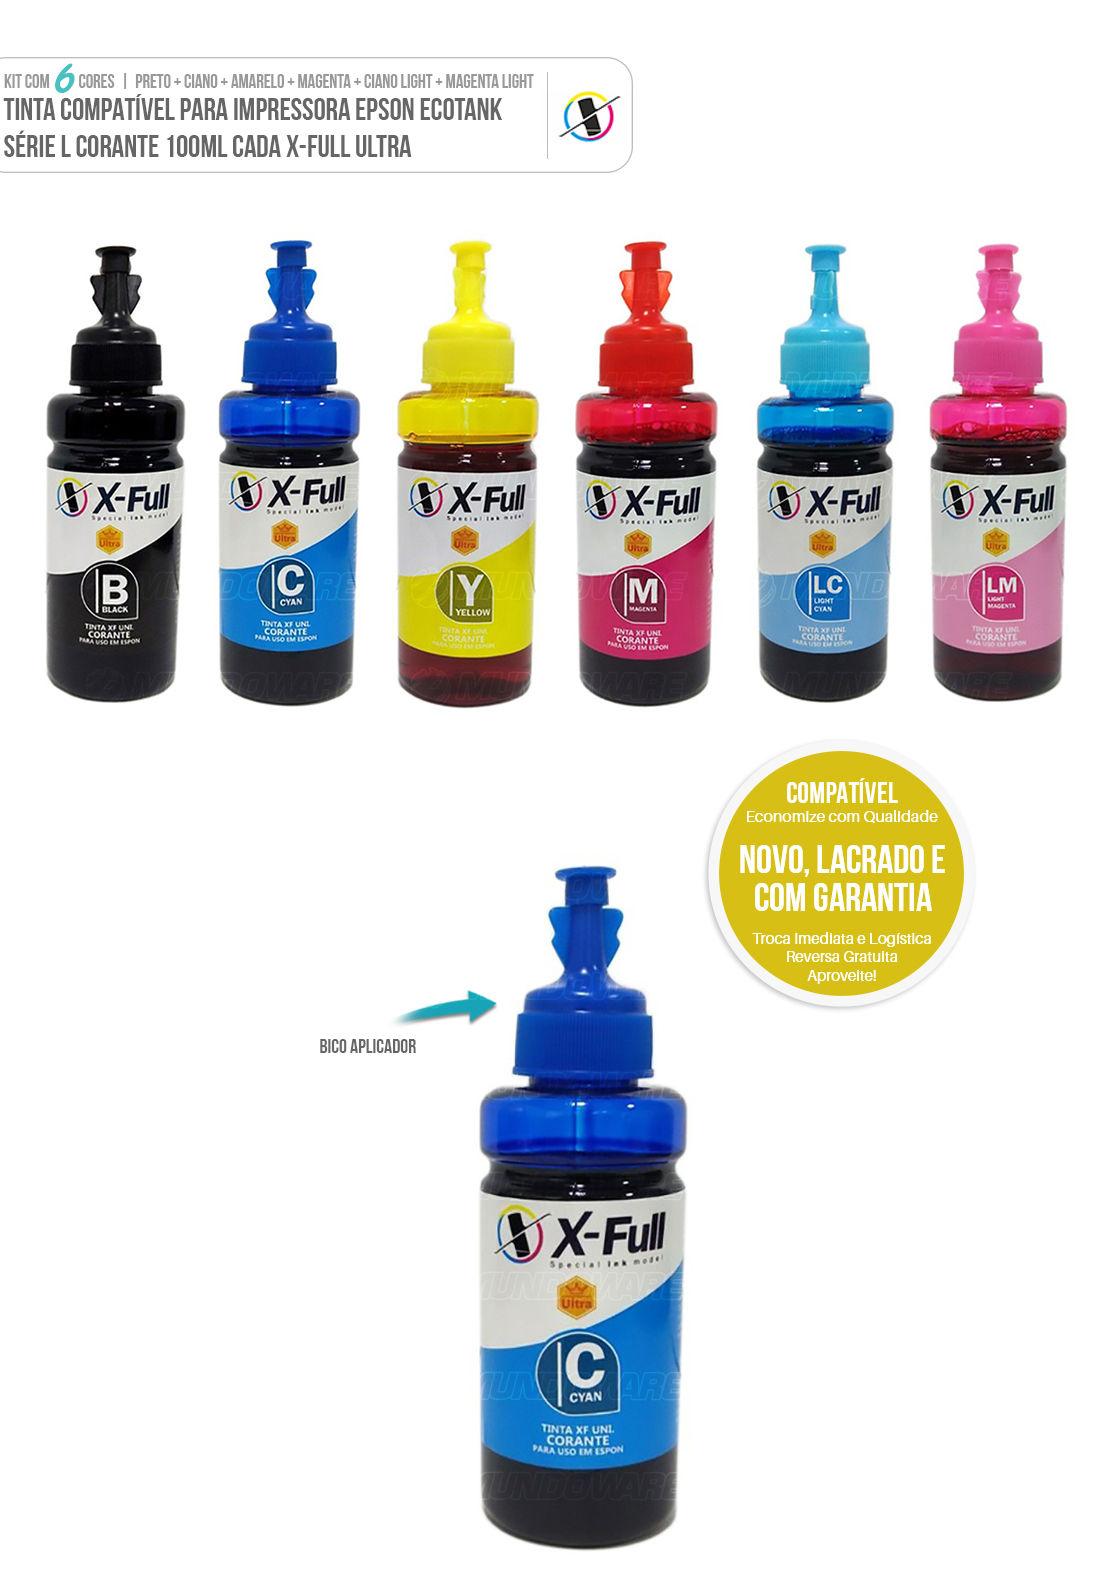 Kit Colorido 6 cores de Tinta Compatível Corante Ultra para Epson Ecotank L800 L805 L810 L850 L1800